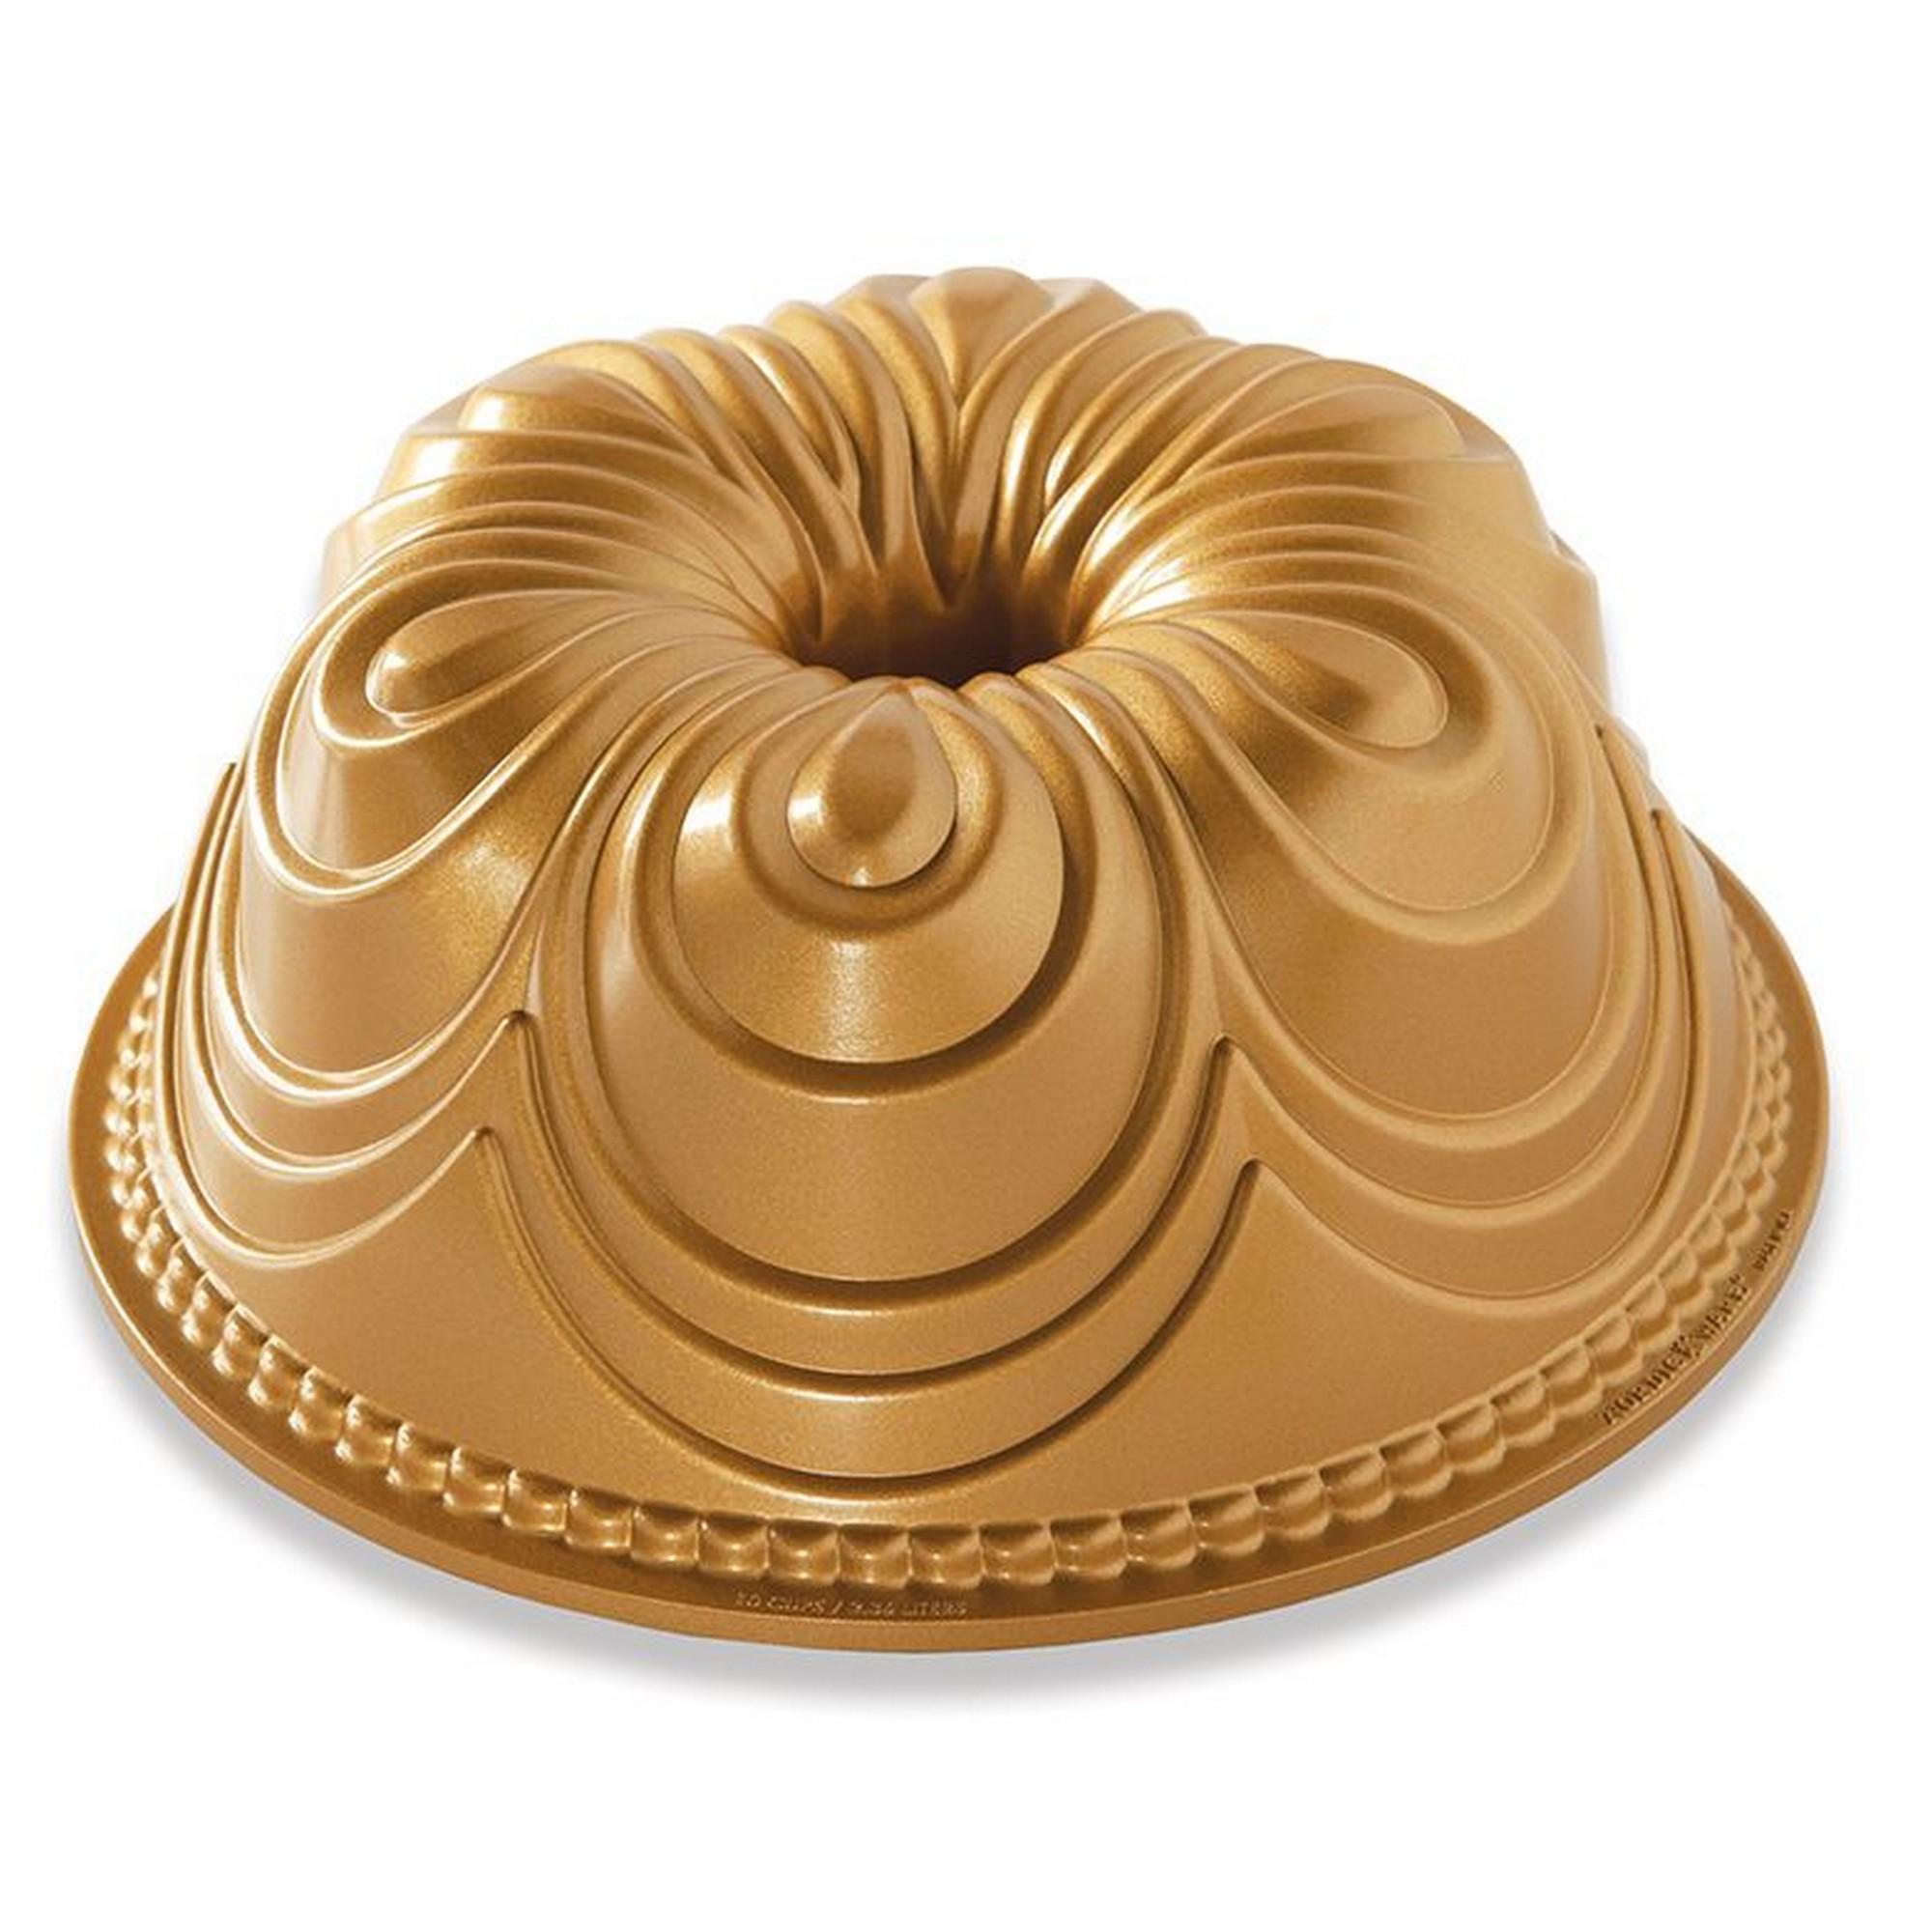 Fôrma para Bolo Nordic Ware Chiffon Bundt Redonda 25cm Dourada de Alumínio Fundido